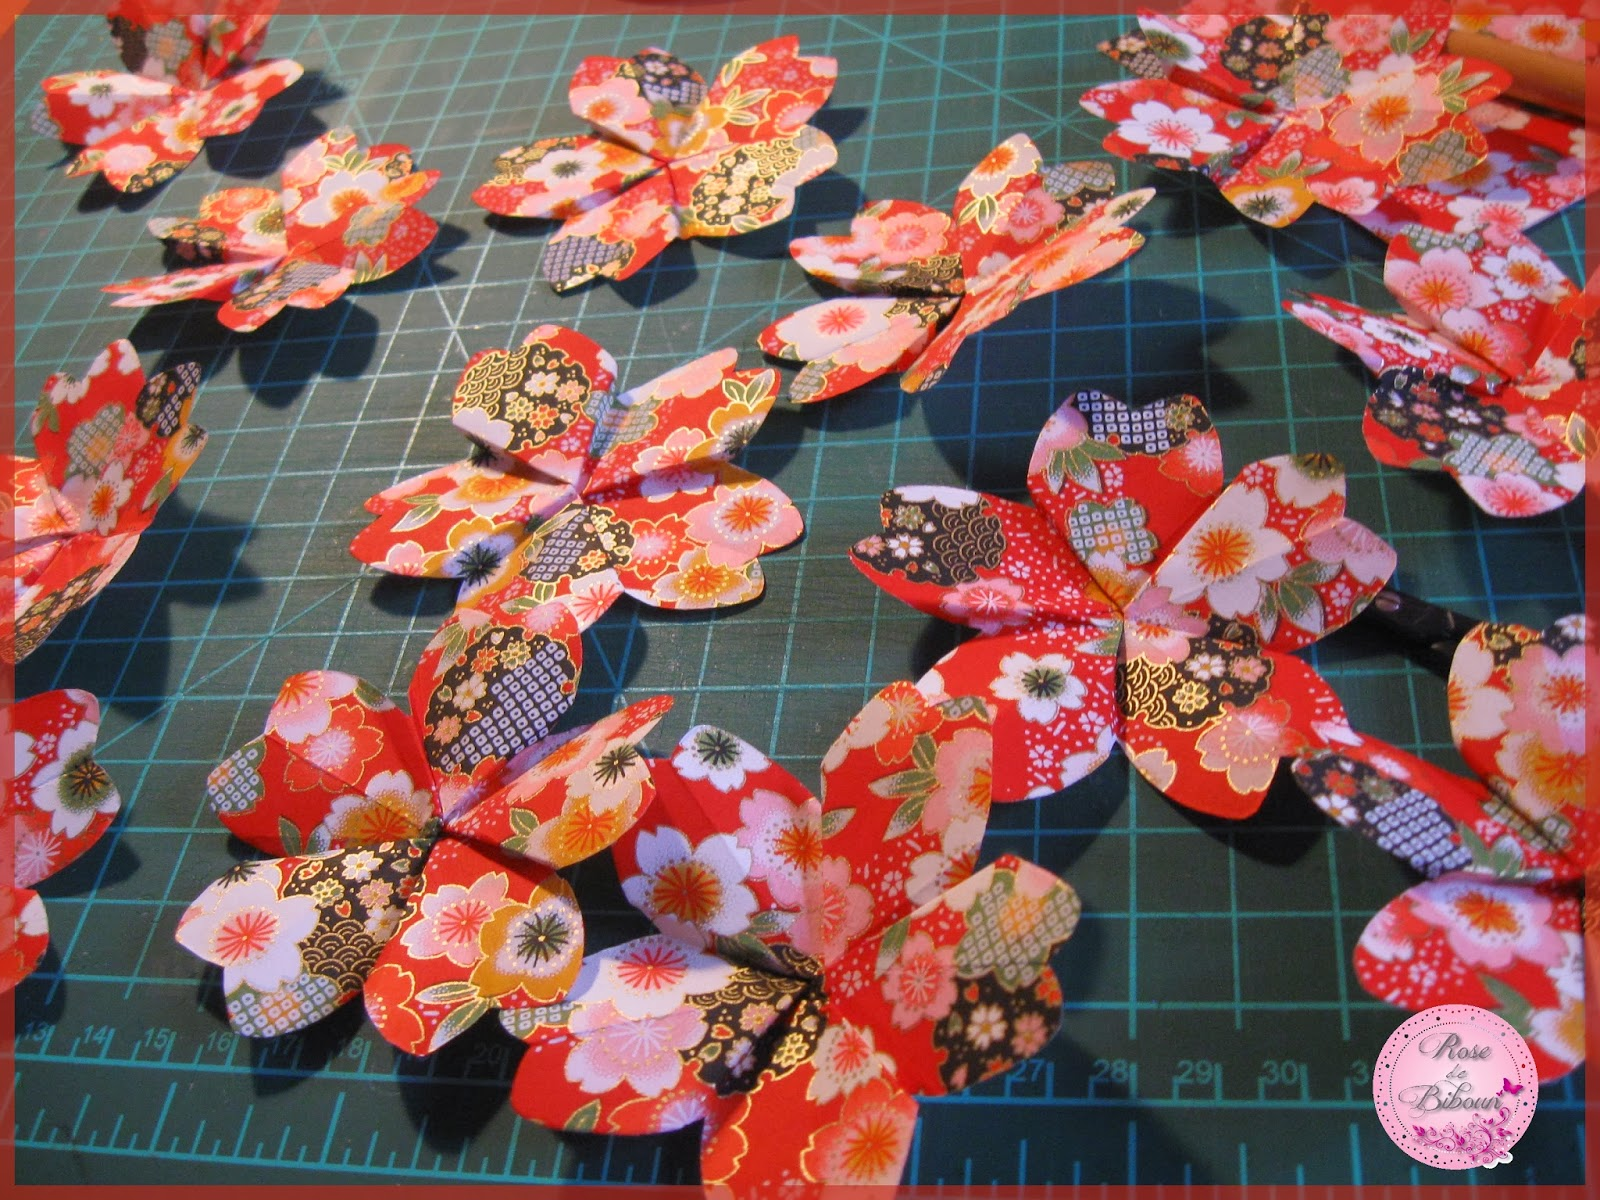 rose de biboun mariage et remerciements des fleurs de sakura en origami. Black Bedroom Furniture Sets. Home Design Ideas